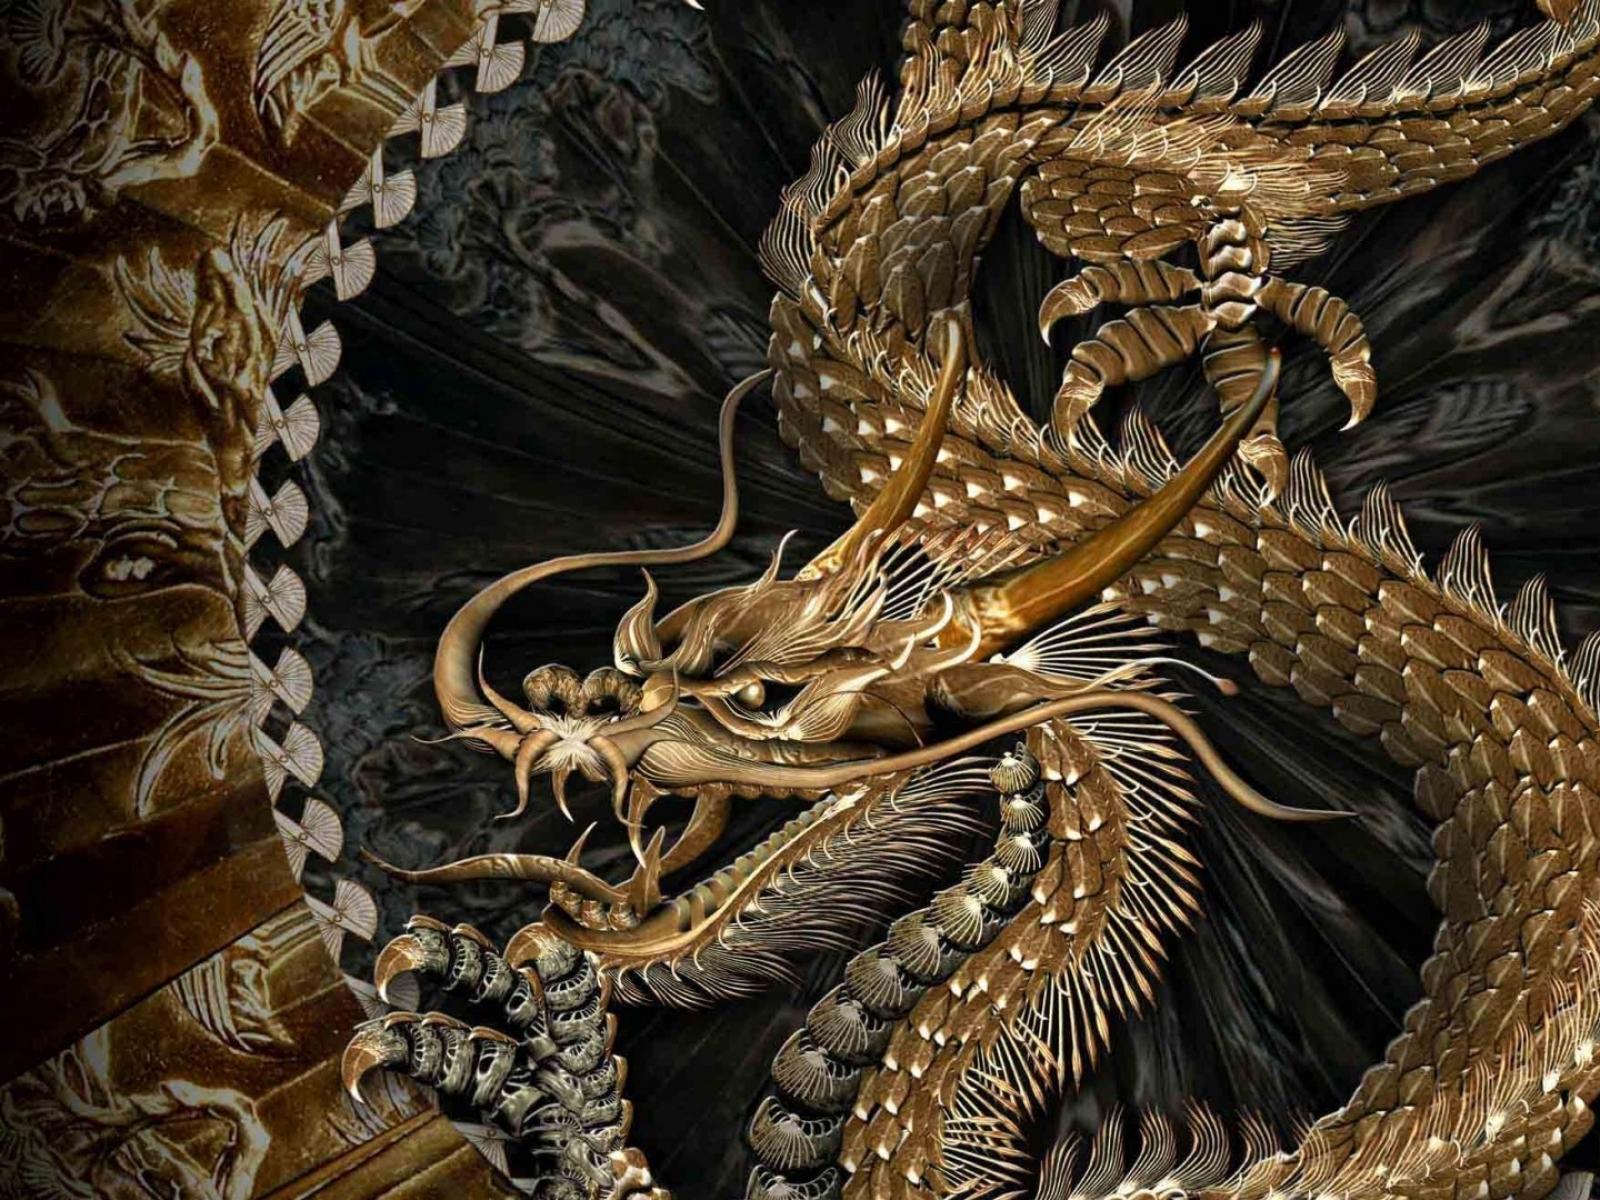 92 ] Chinese Dragons Wallpapers On WallpaperSafari